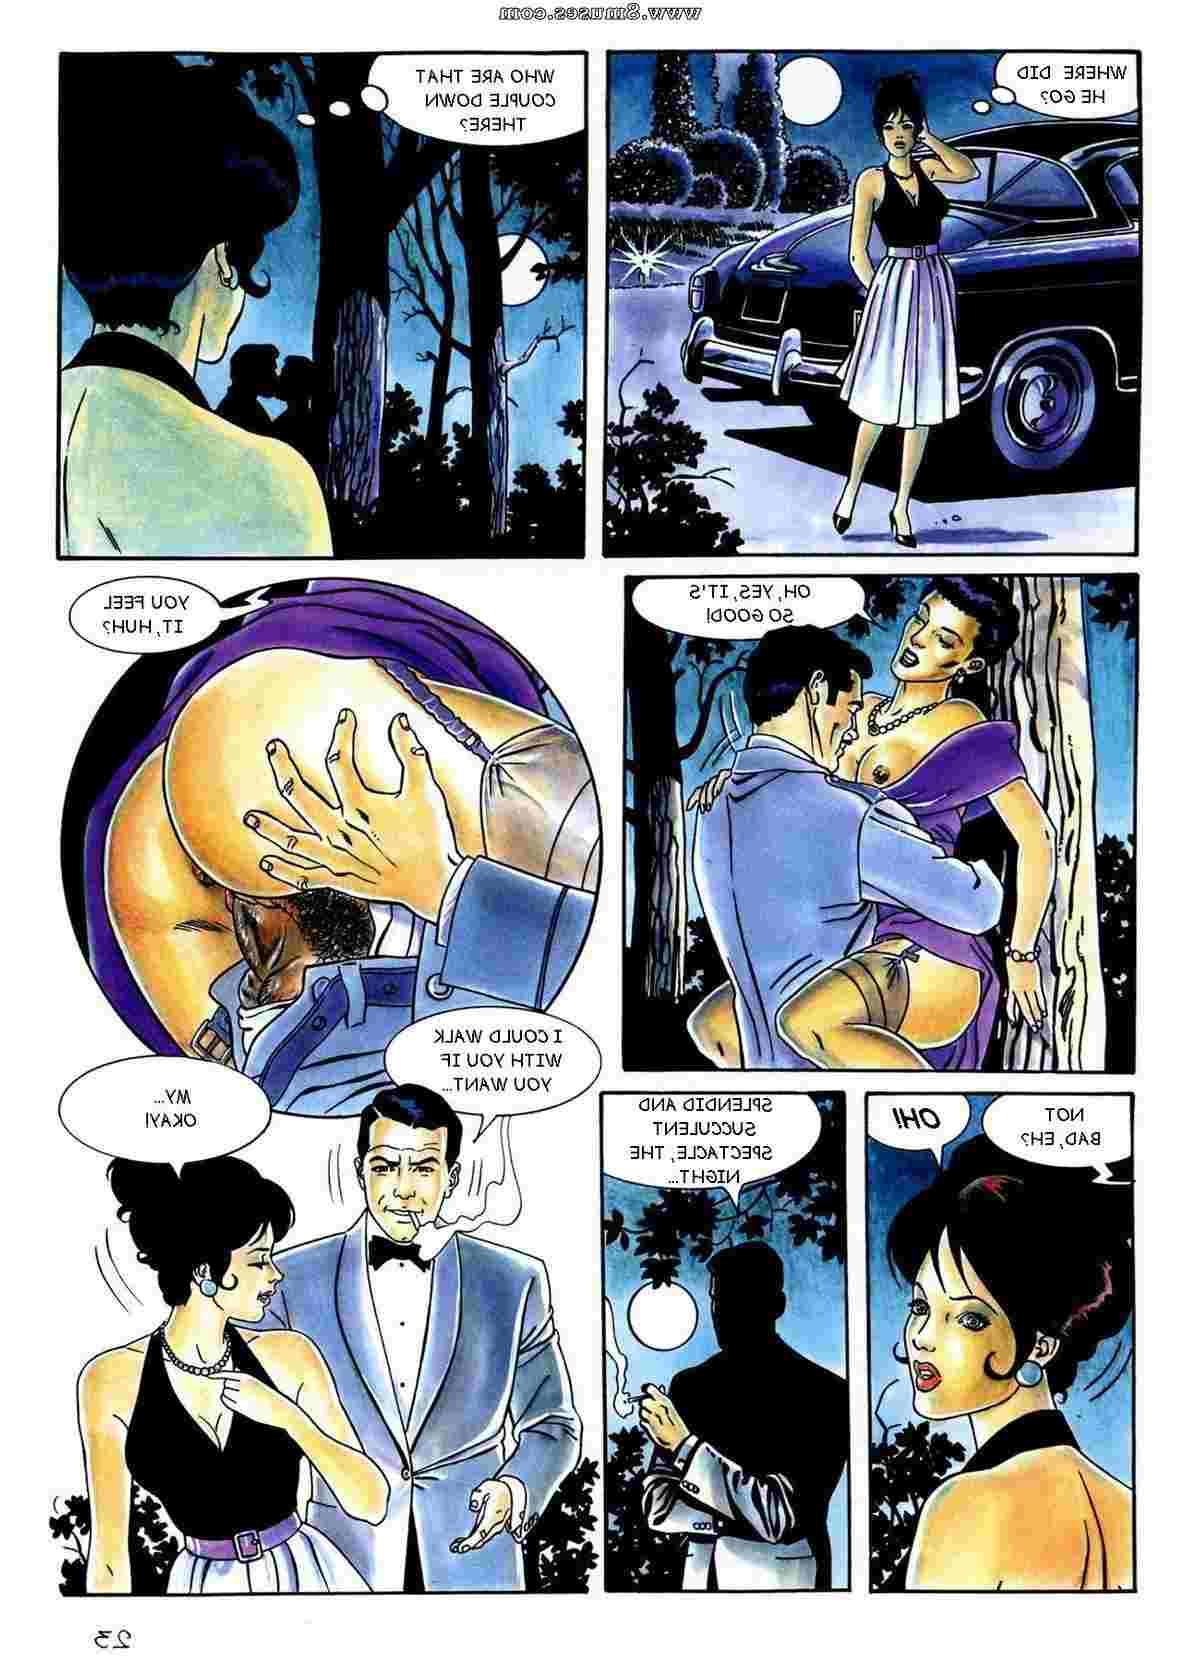 Stramaglia-Morale-Comics/Anna-Perverted-Innocence Anna_Perverted_Innocence__8muses_-_Sex_and_Porn_Comics_26.jpg